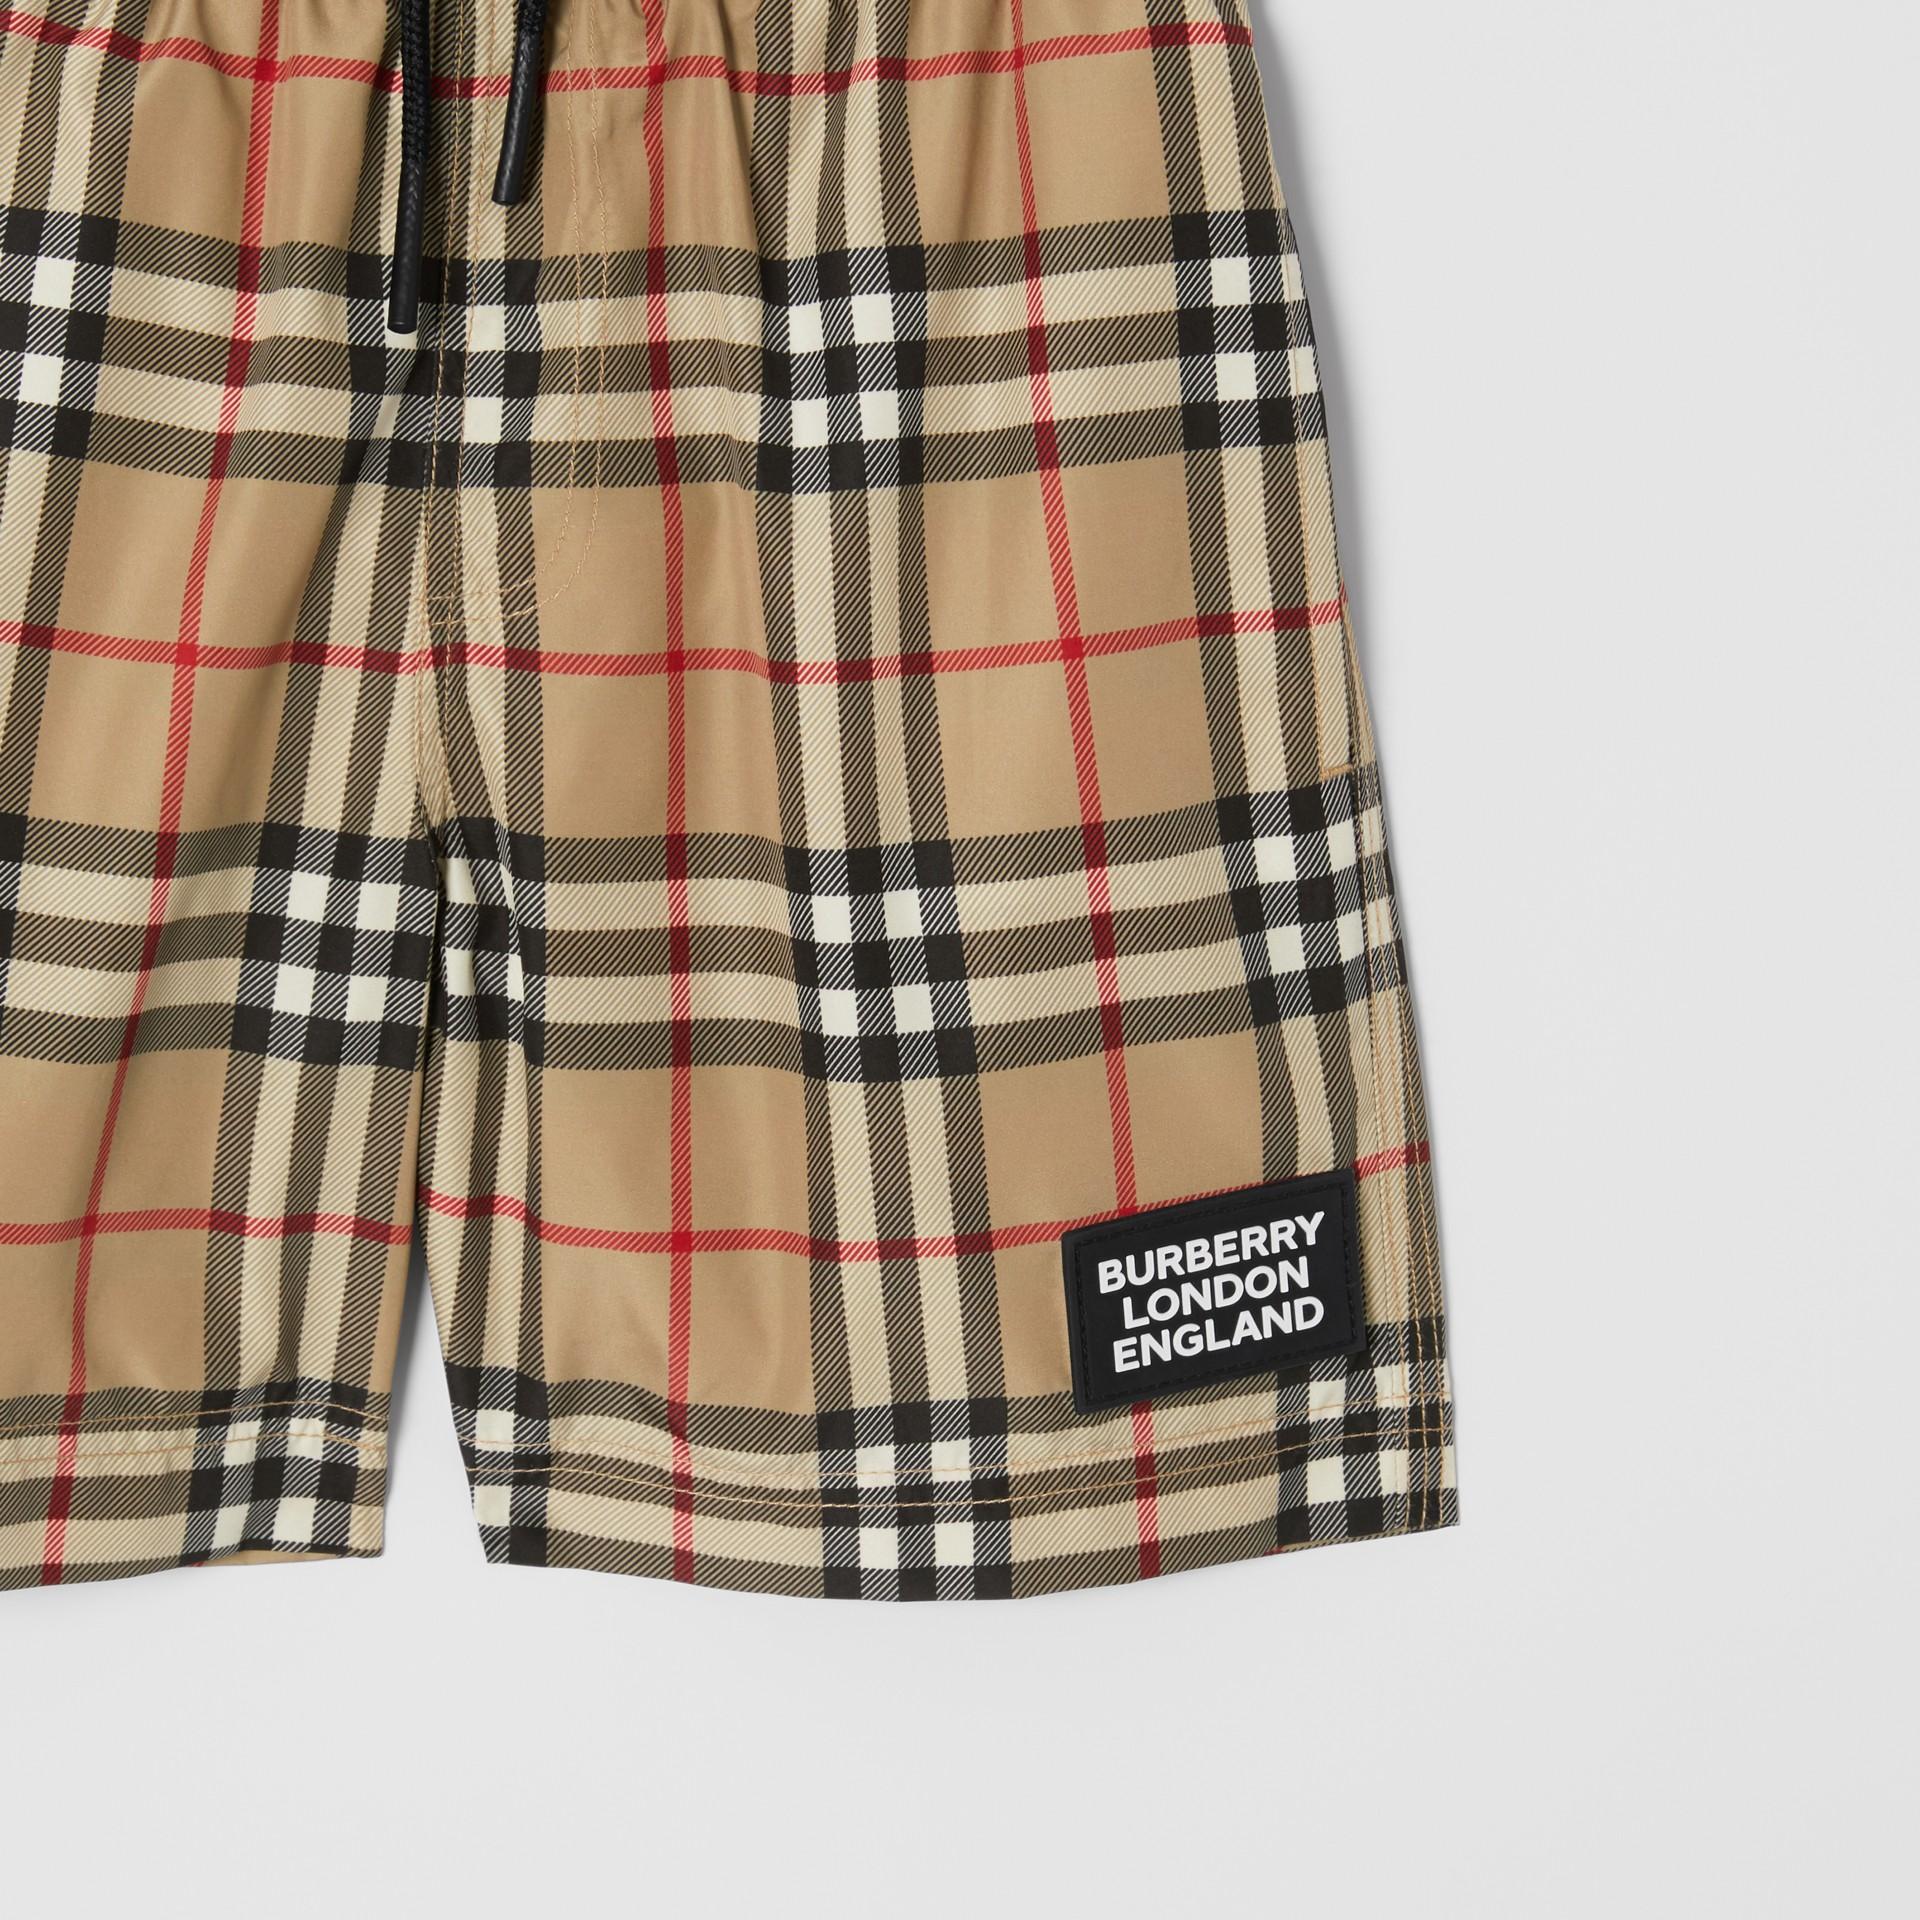 Logo Appliqué Vintage Check Swim Shorts in Archive Beige | Burberry - gallery image 4